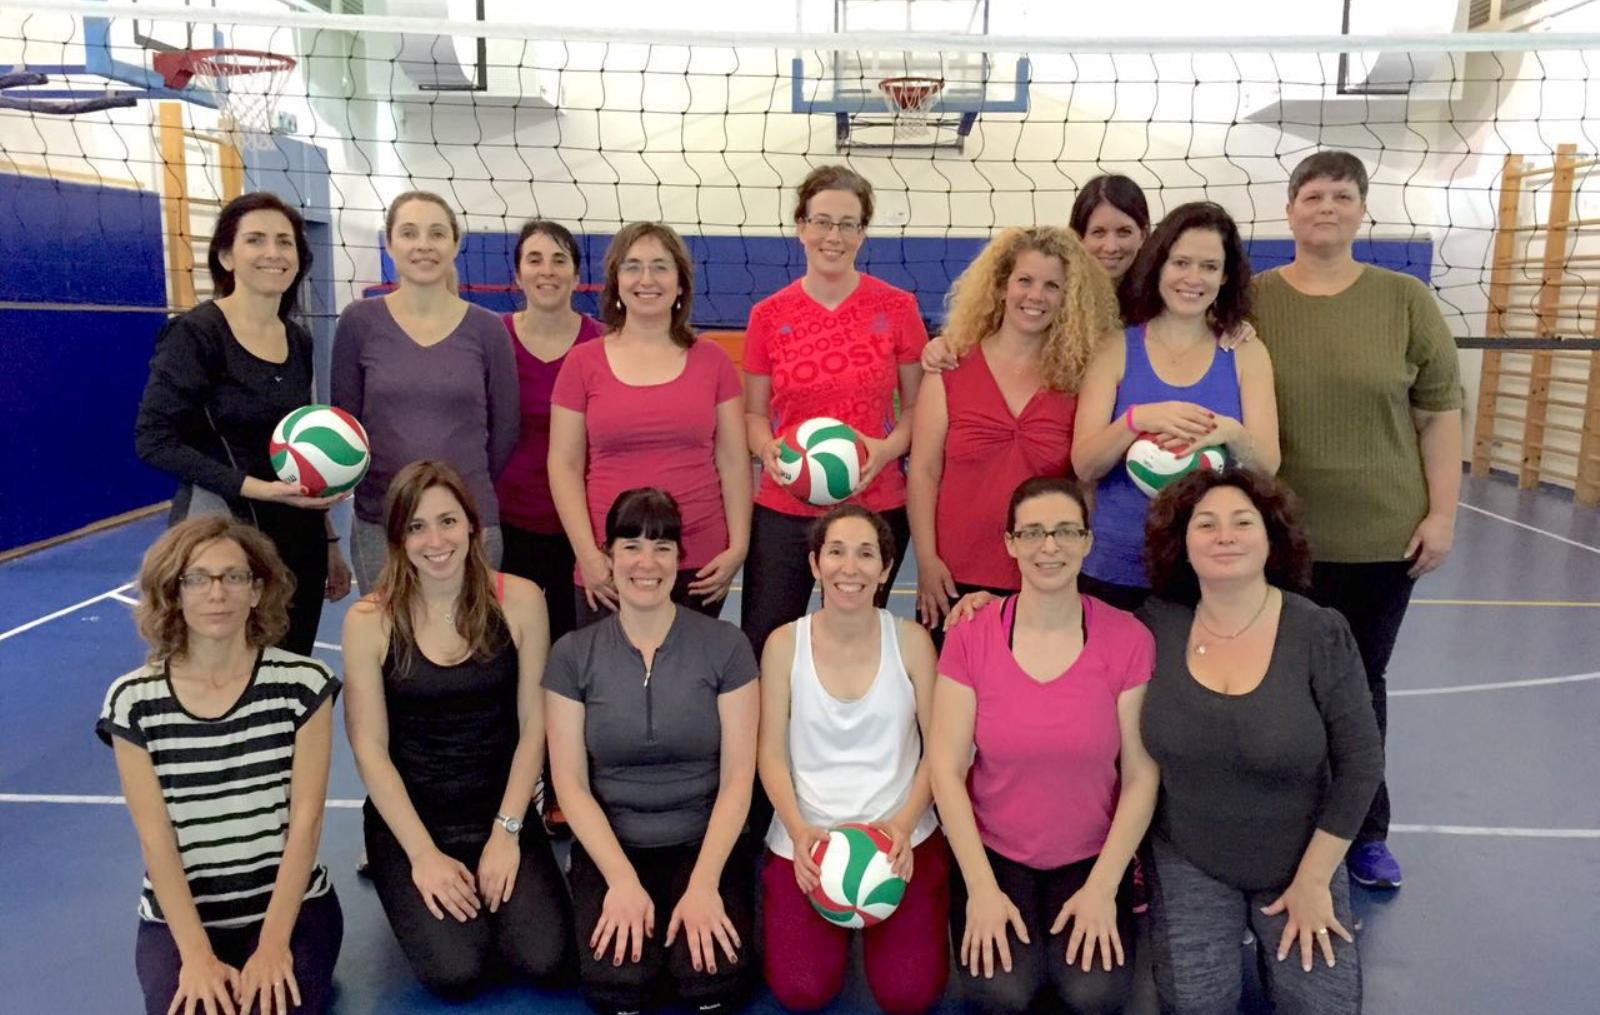 The Magen 1 team in Tel Aviv. Photo: courtesy